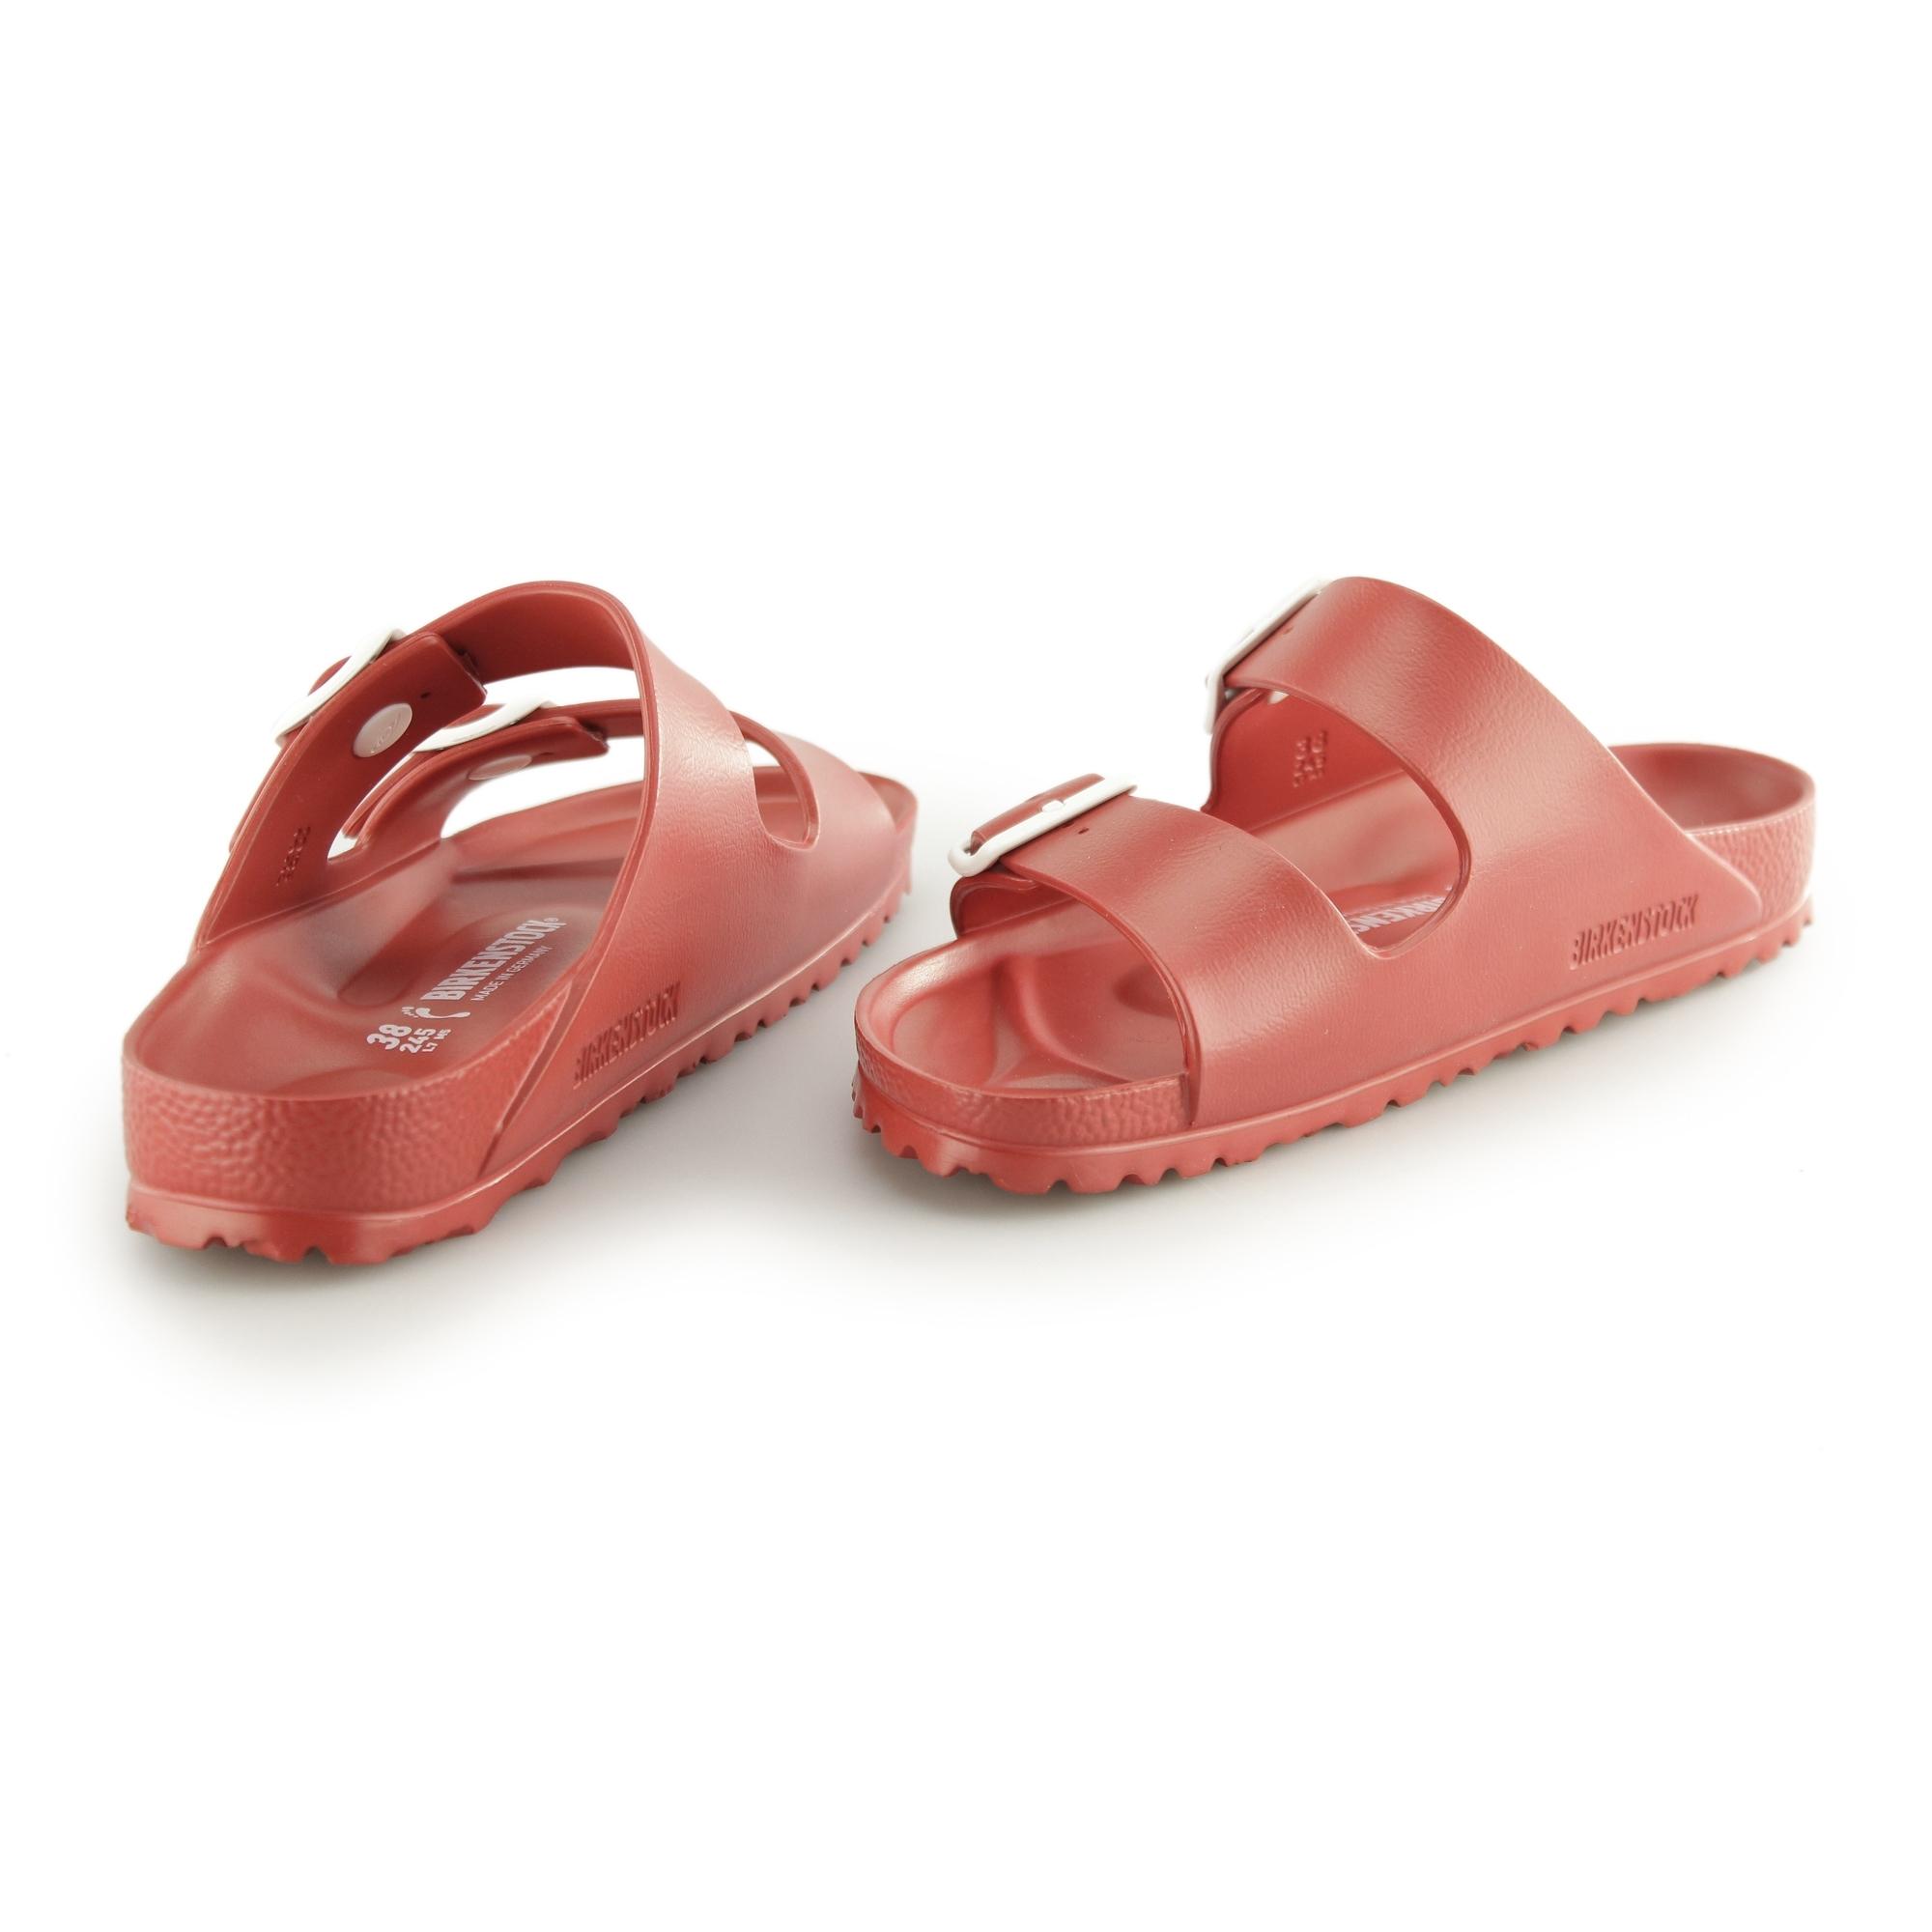 Birkenstock-EVA-Collection-Ladies-Womens-Summer-Beach-Toe-Post-Flip-Flop-Sandals thumbnail 53